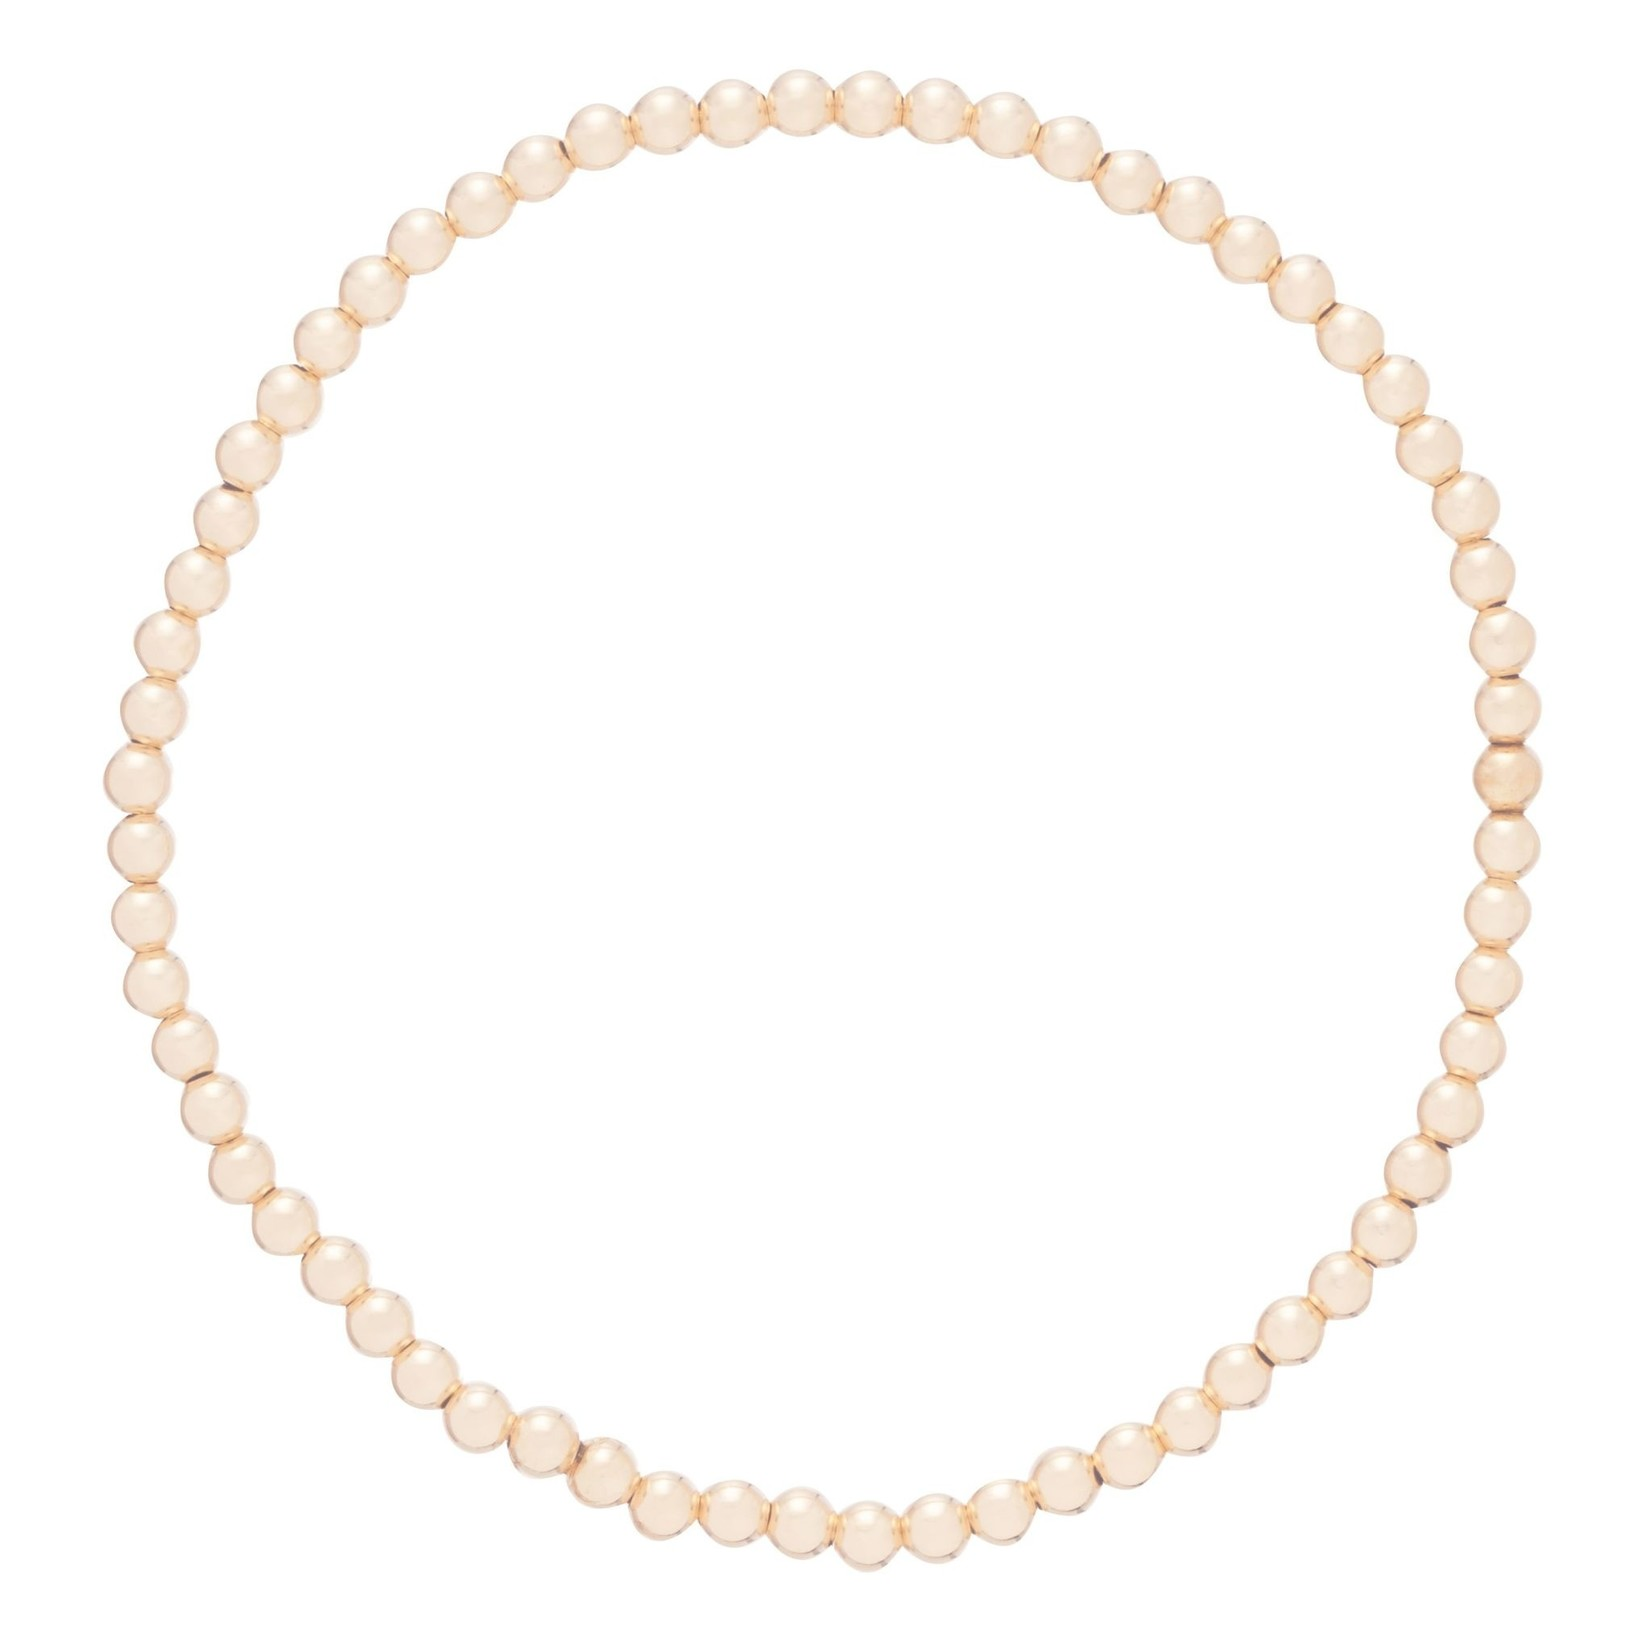 Enewton Design Extends Classic Gold 4mm Bead Bracelet